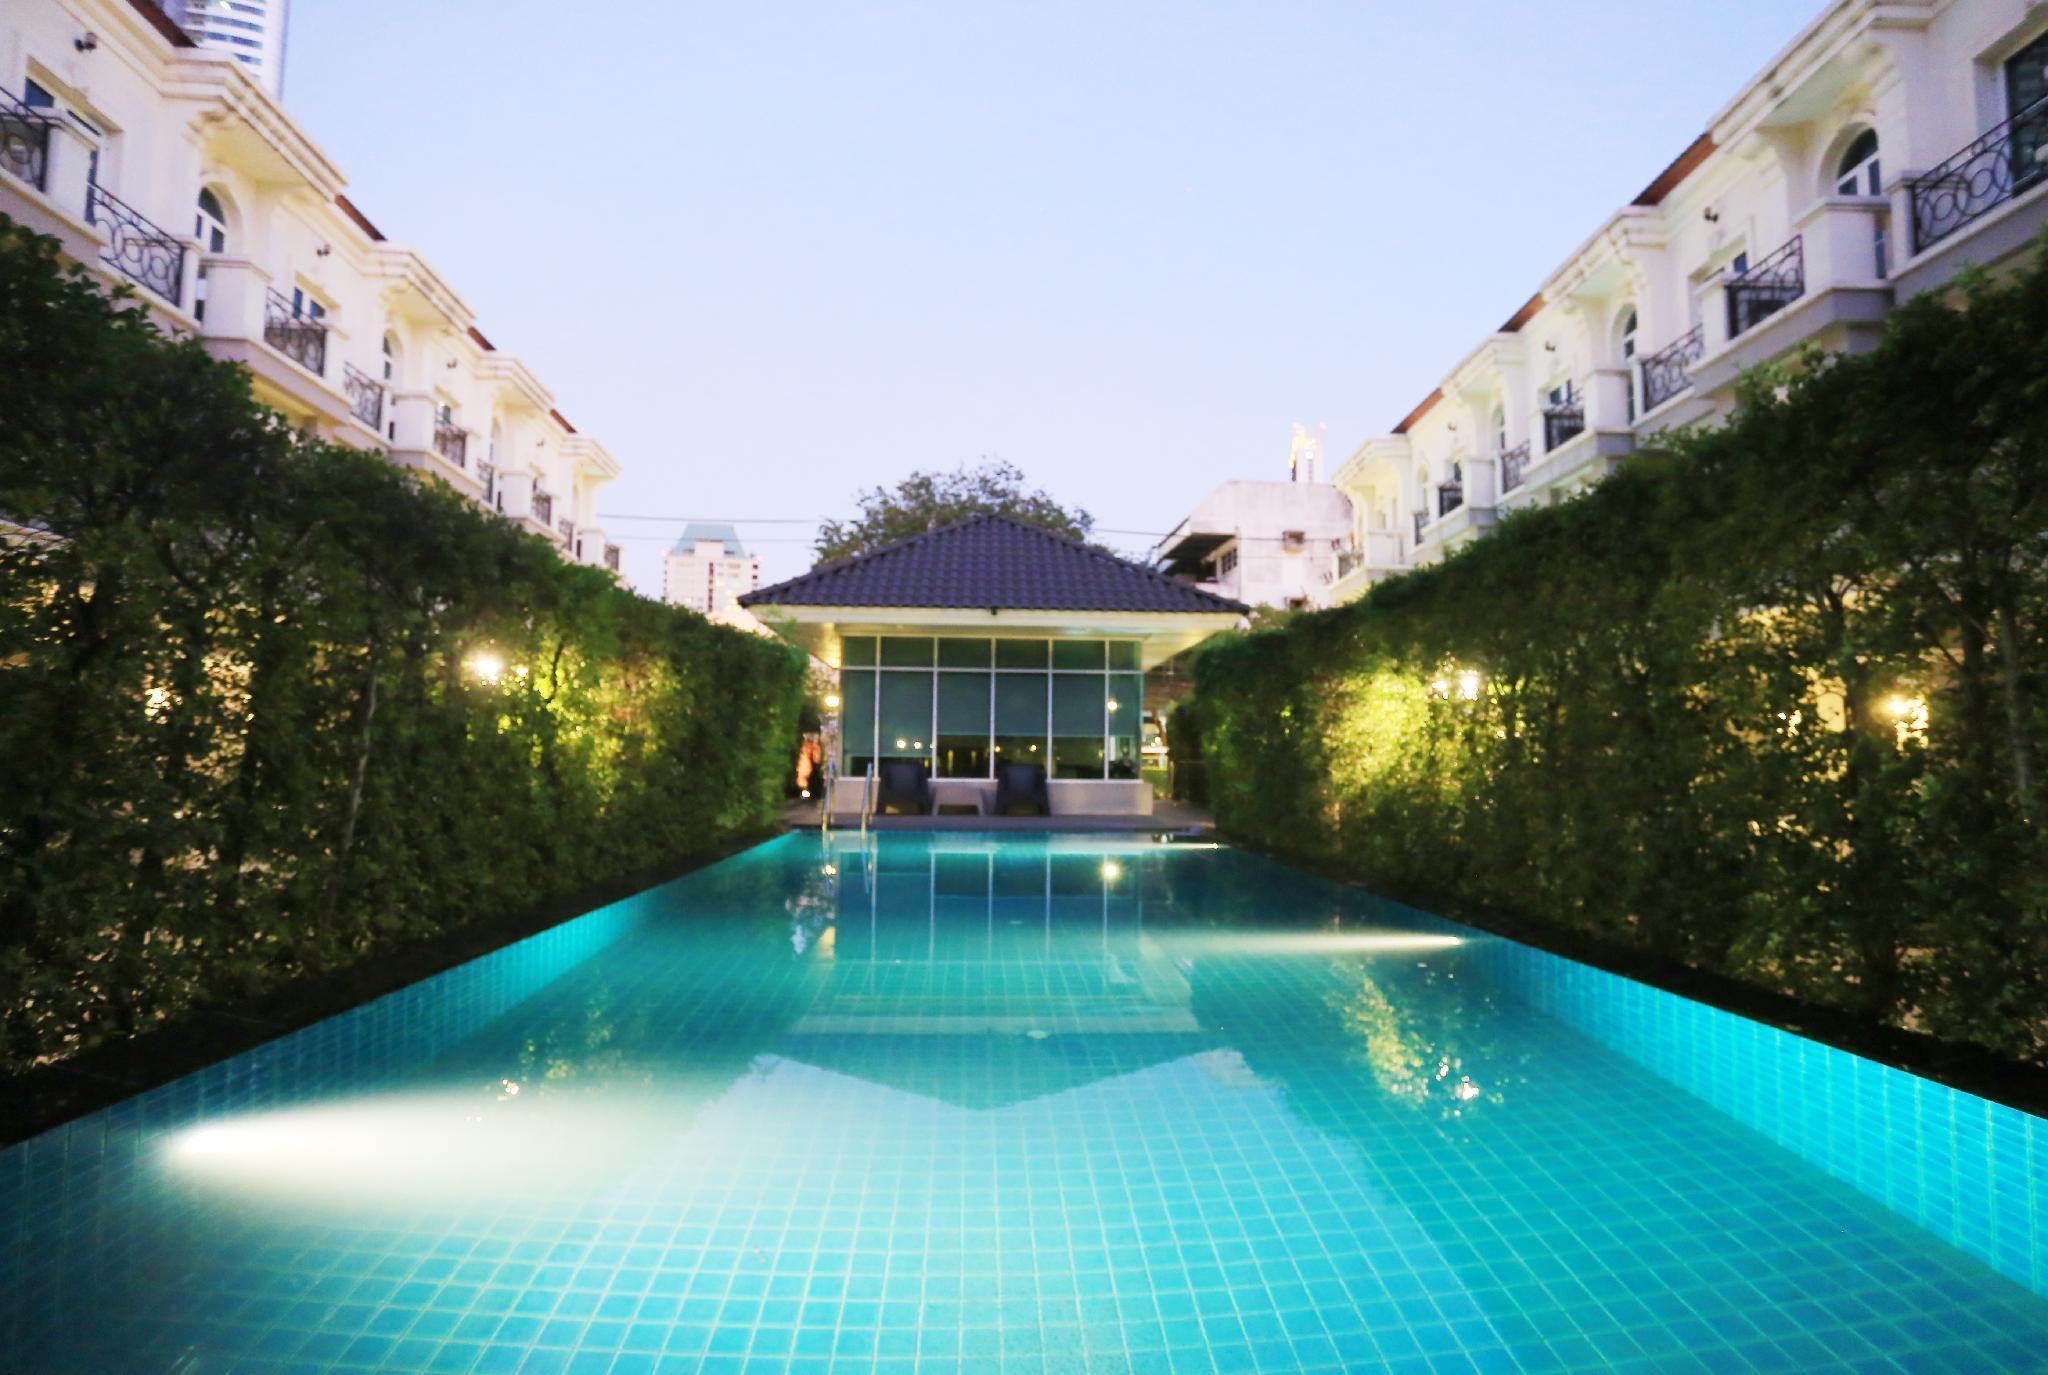 Lovely  Warm villa with swimming pool(HOME B) วิลลา 3 ห้องนอน 3 ห้องน้ำส่วนตัว ขนาด 280 ตร.ม. – สุขุมวิท